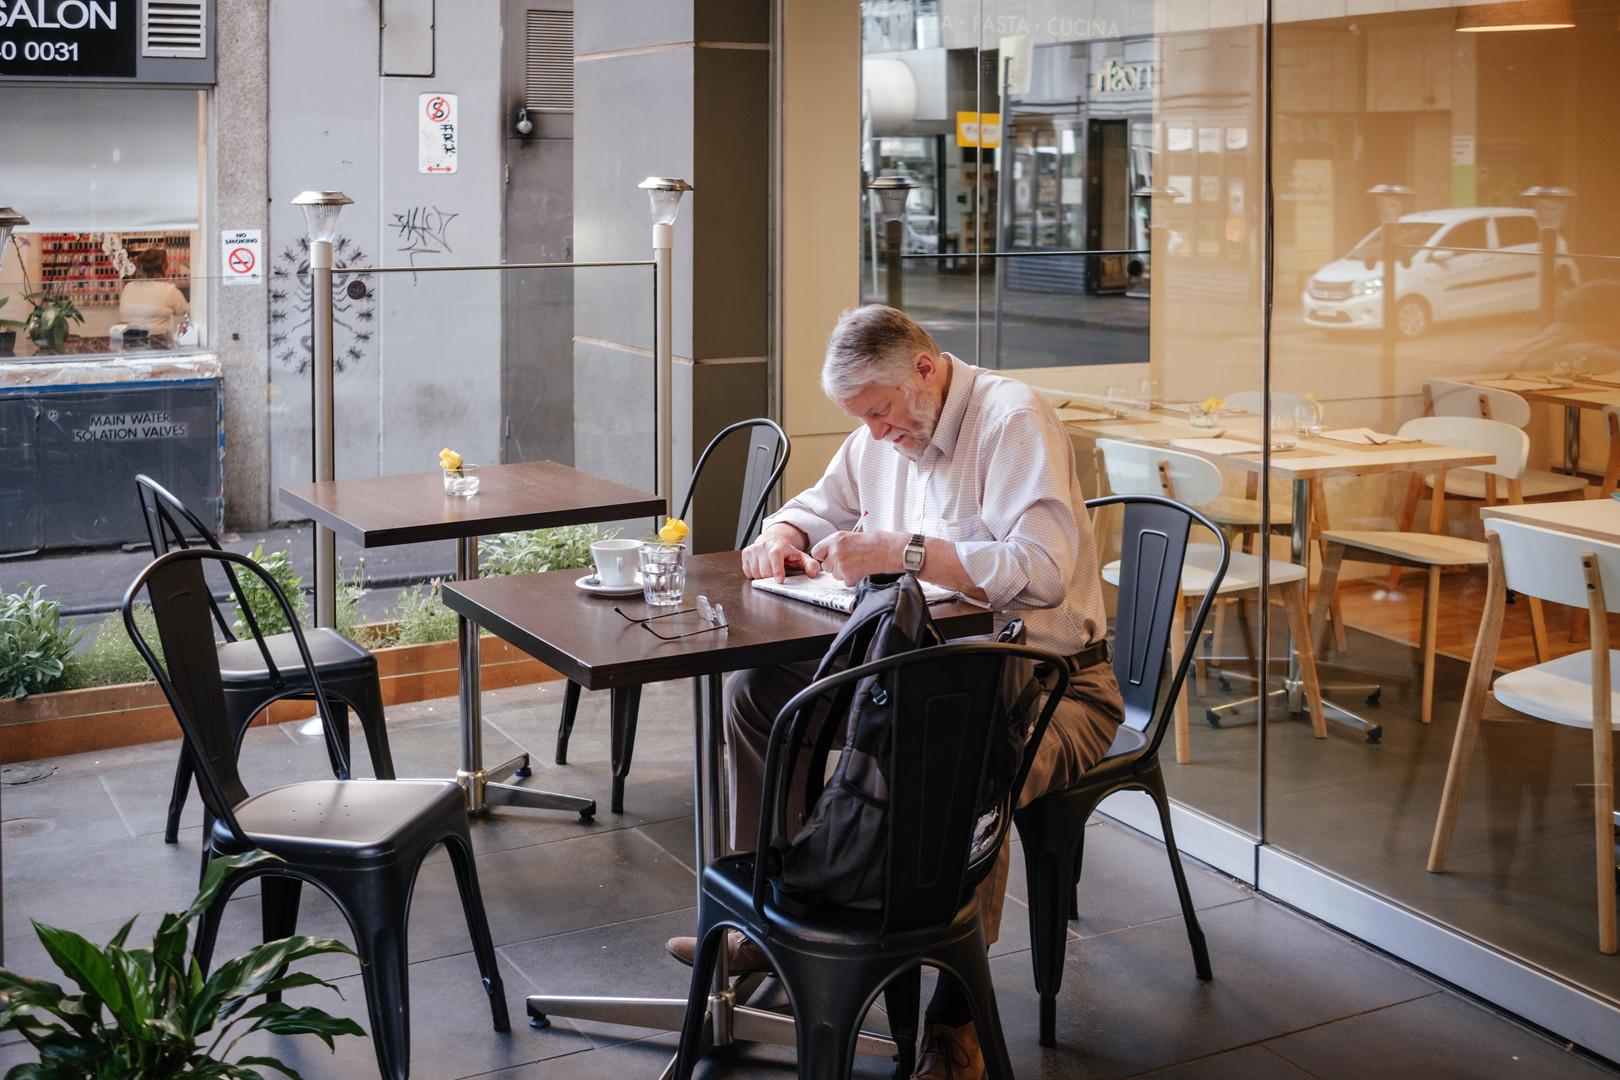 Senior in Cafe writing in Journal